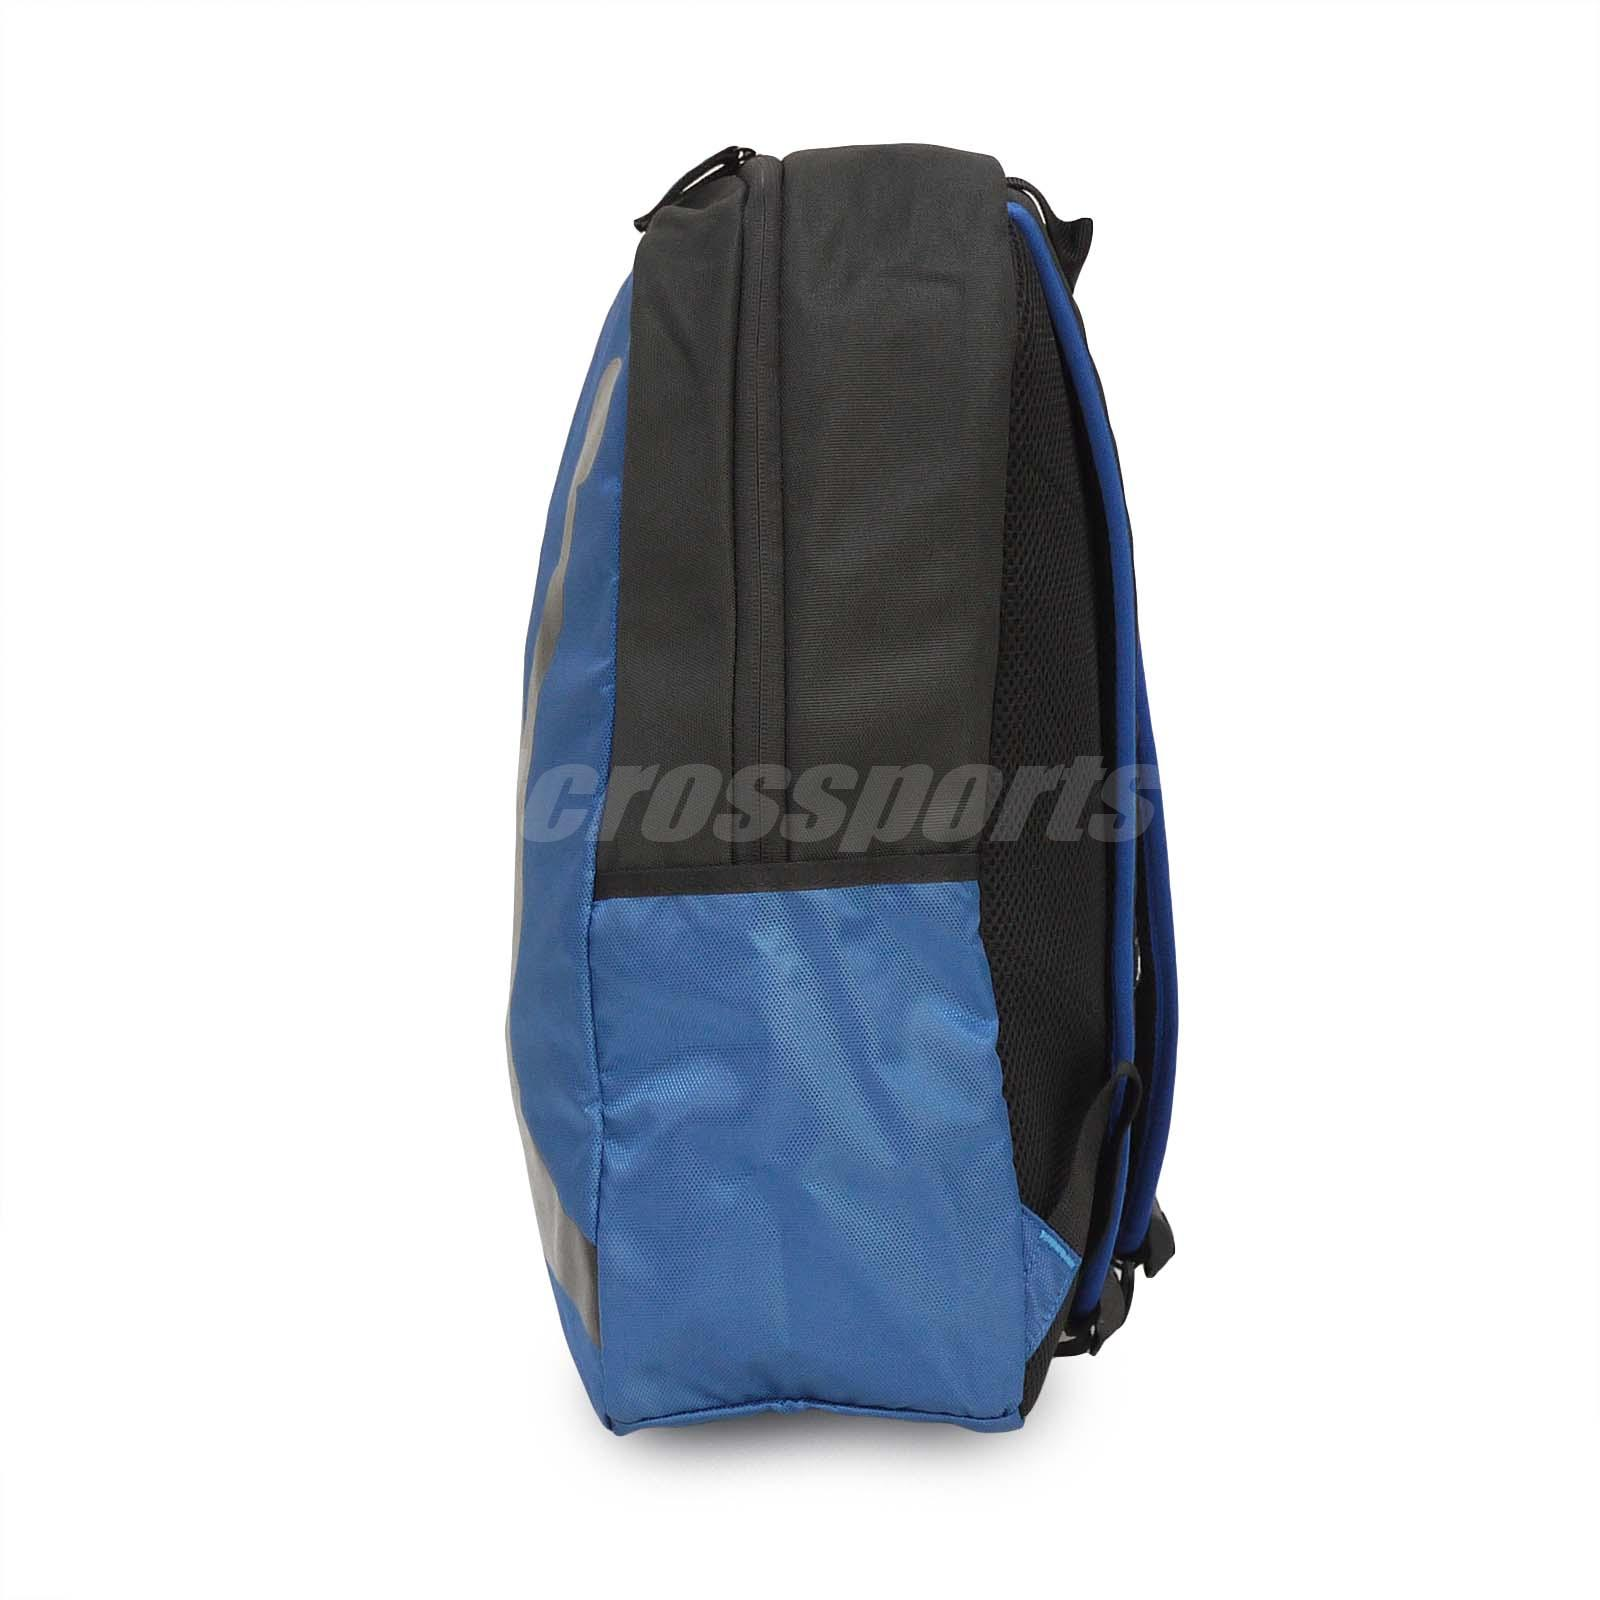 dbd7a27e7bcd Nike Air Jordan Crossover Pack 24L Blue Black Training Backpack Bag ...